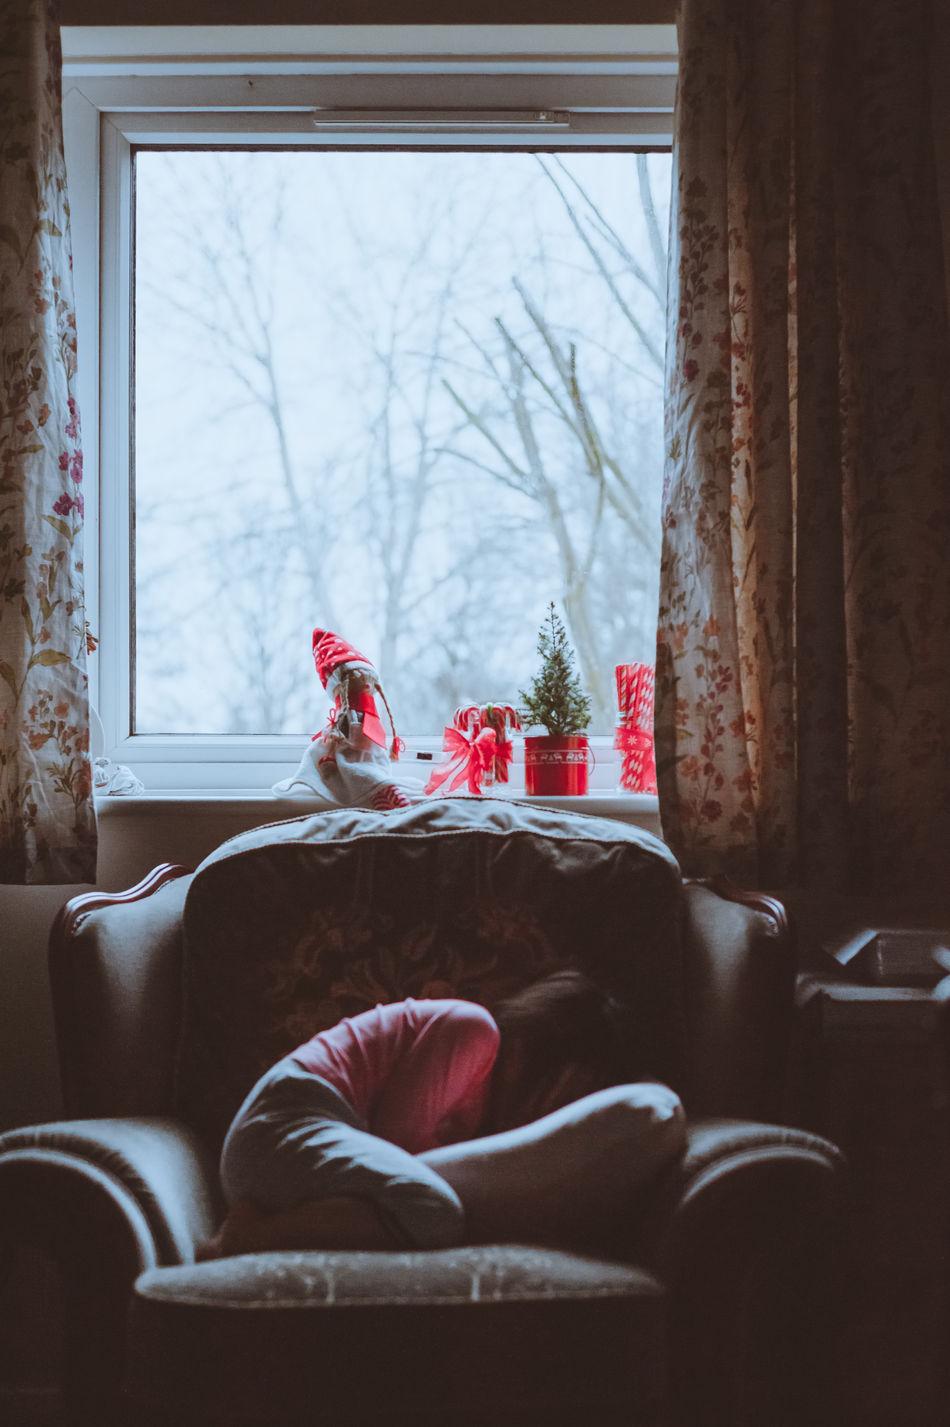 Beautiful stock photos of guten morgen, window, day, flower, no people